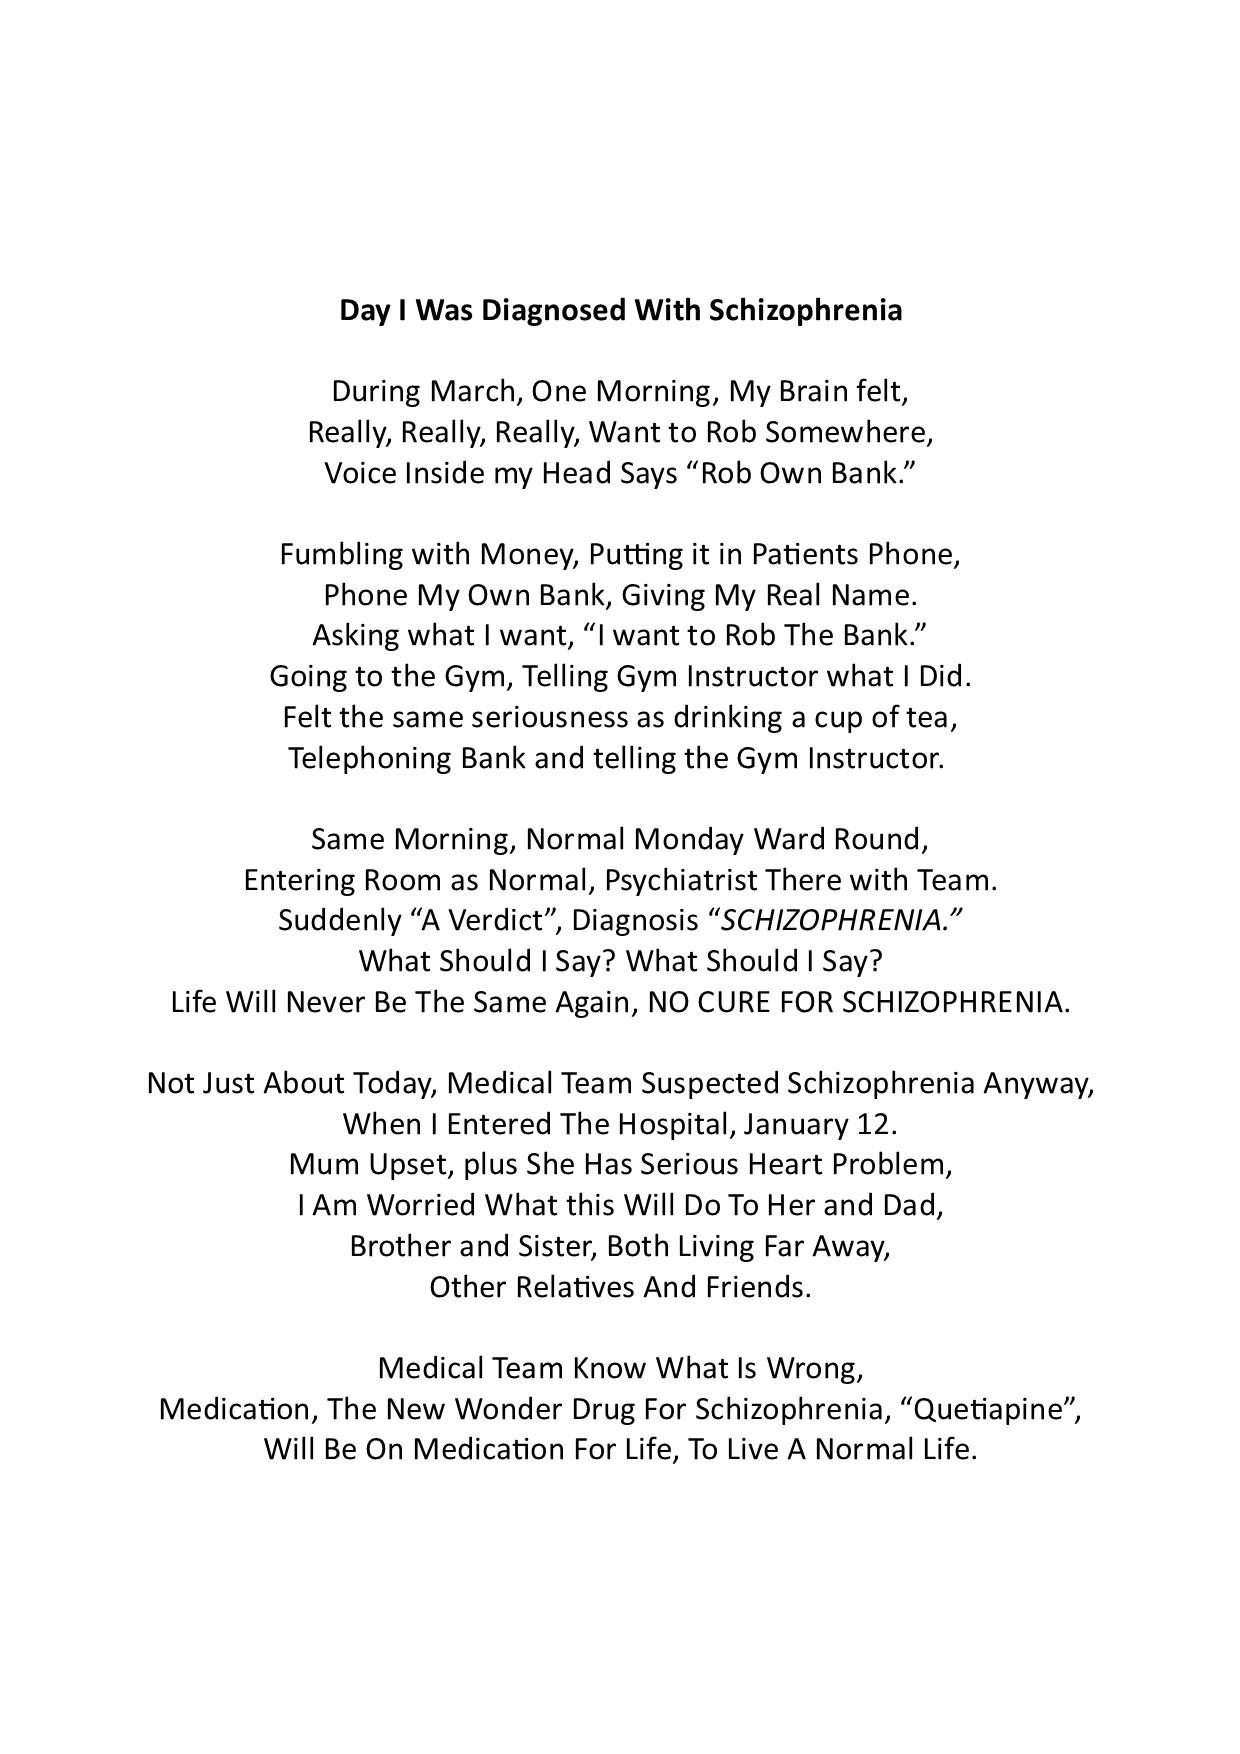 Day I was diagnosed with schizophrenia.jpg